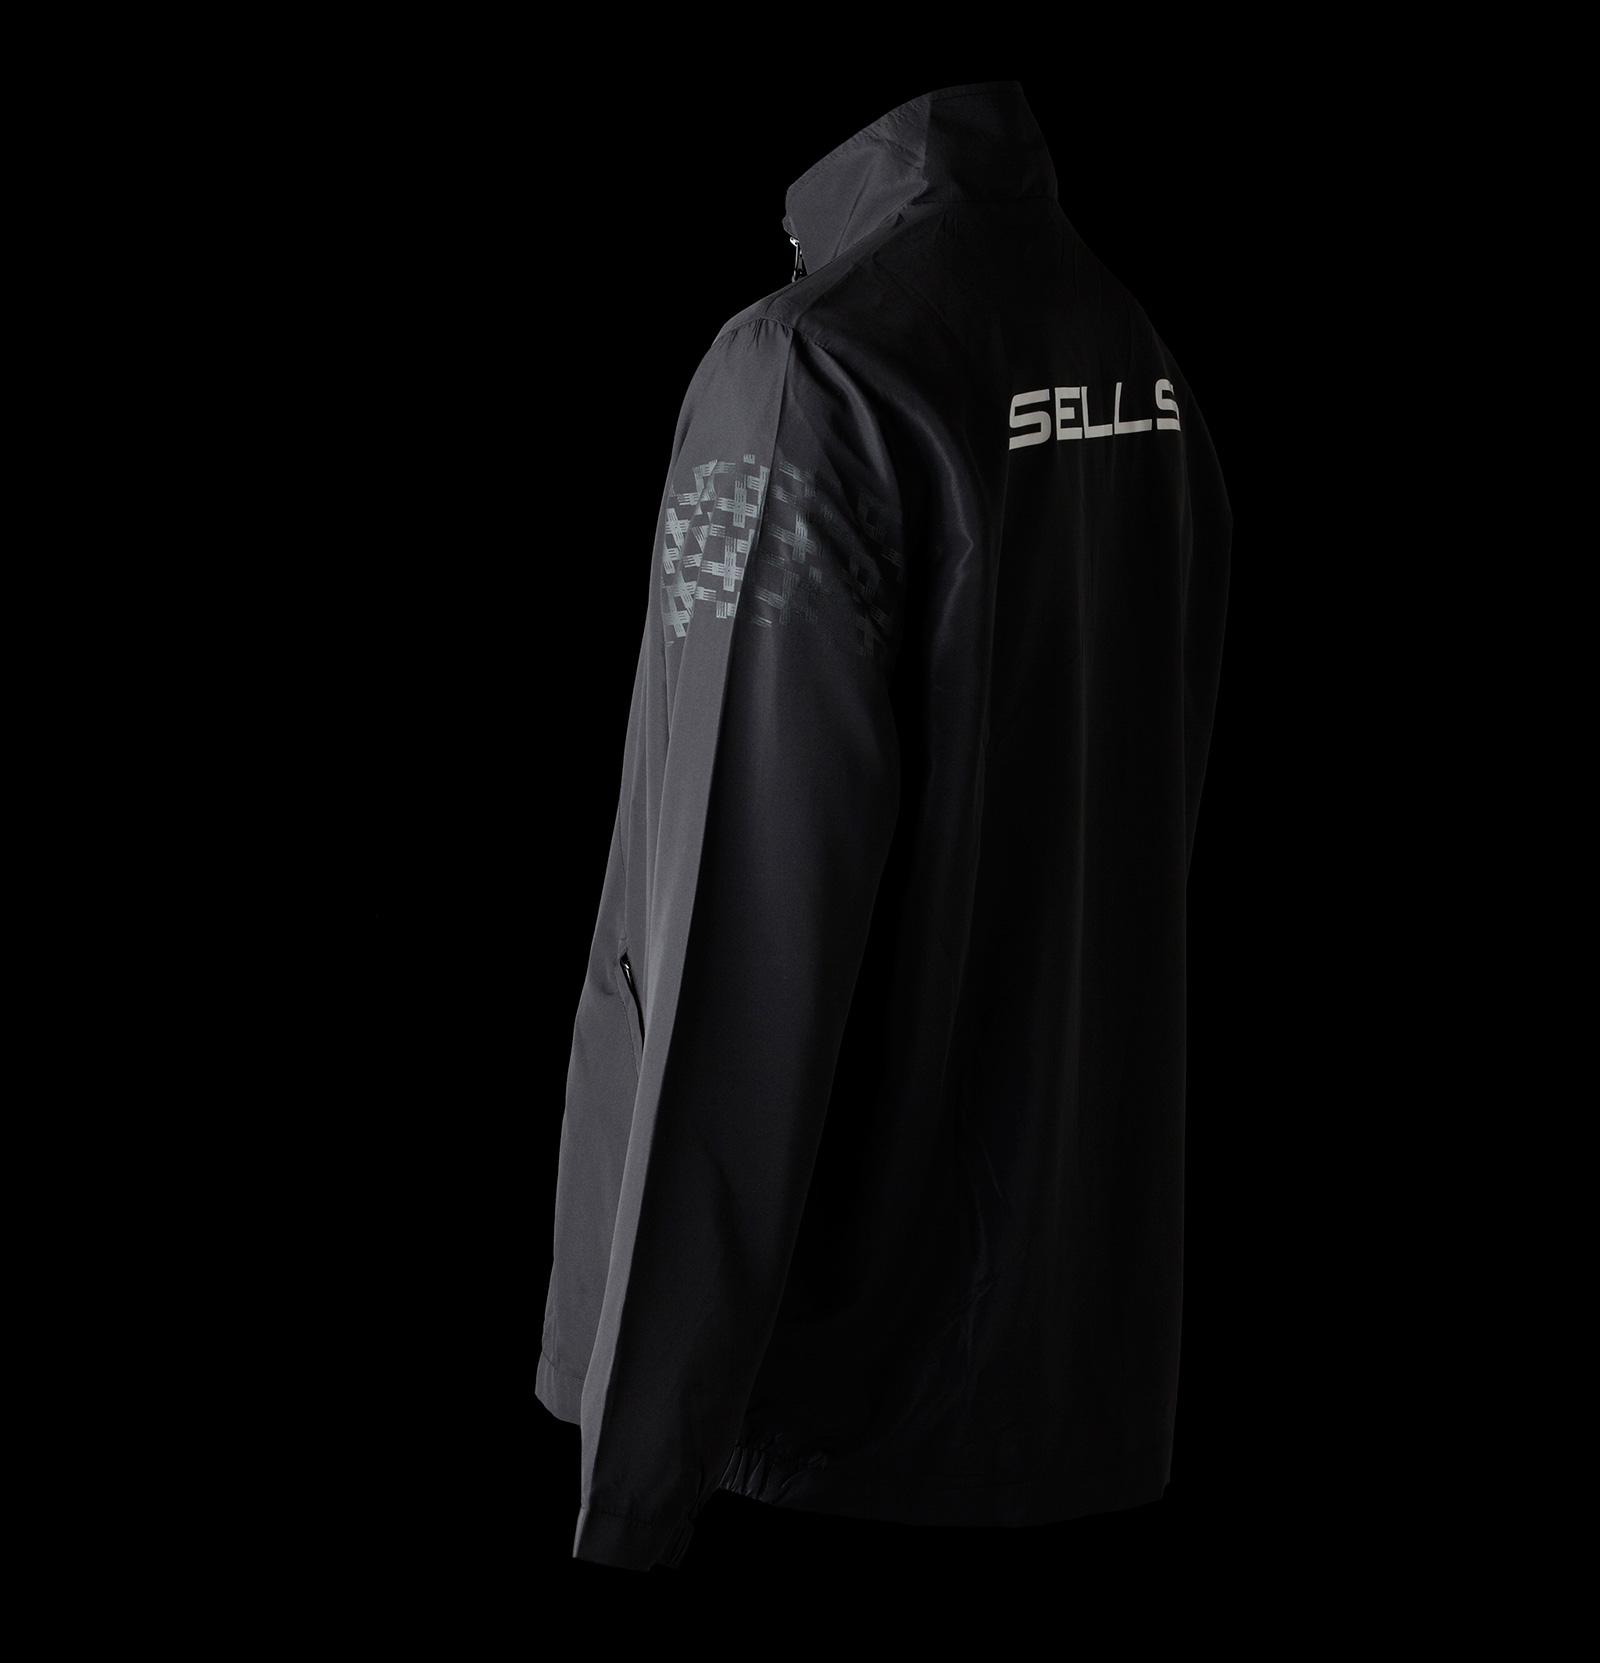 Excel-Travel-Suit-Promo-24